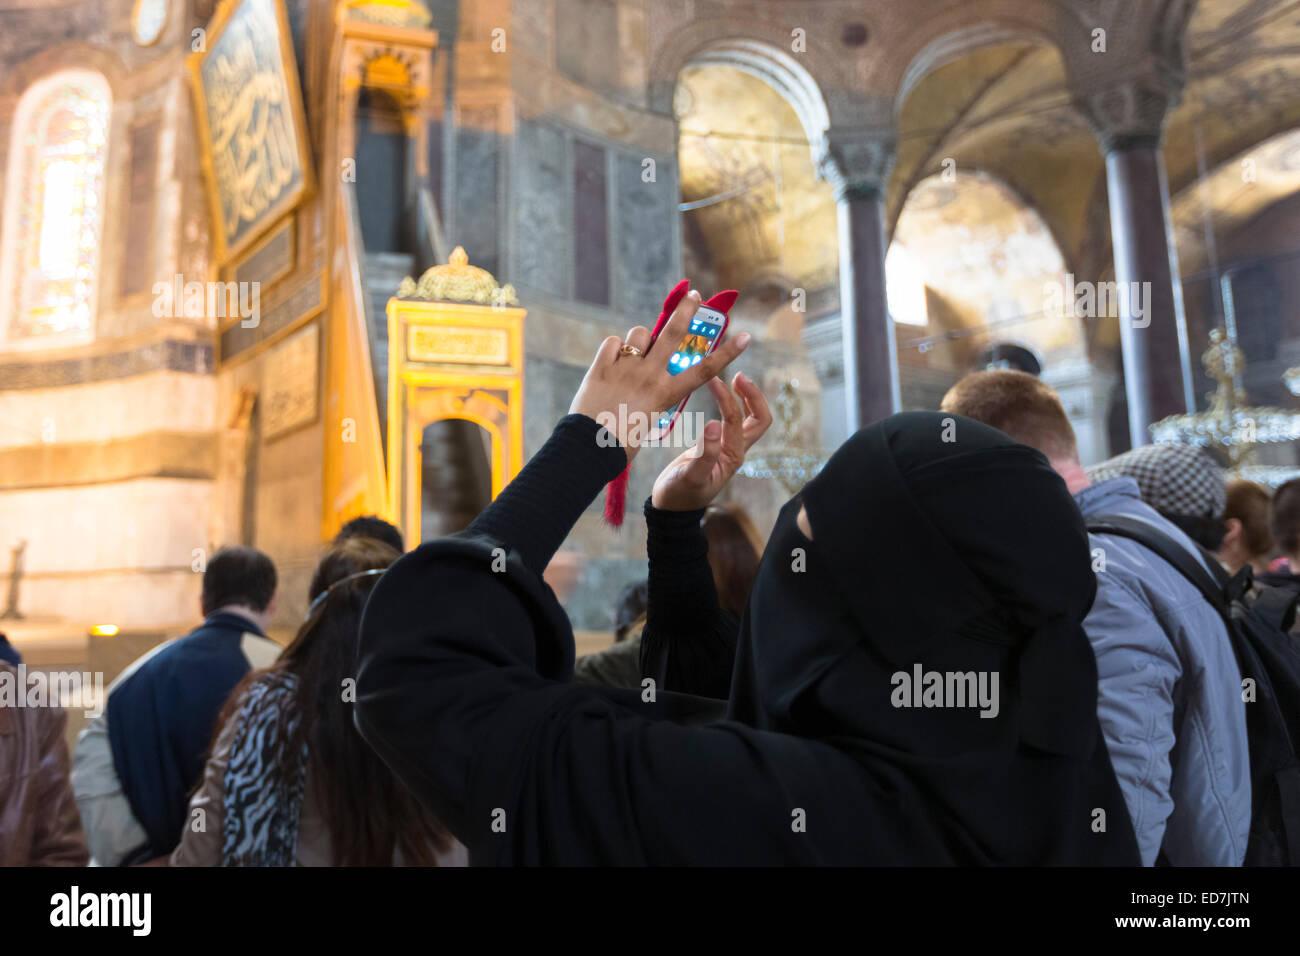 Muslim woman at Hagia Sophia, Ayasofya Muzesi mosque museum wearing niqab using smartphone to take photographs, - Stock Image